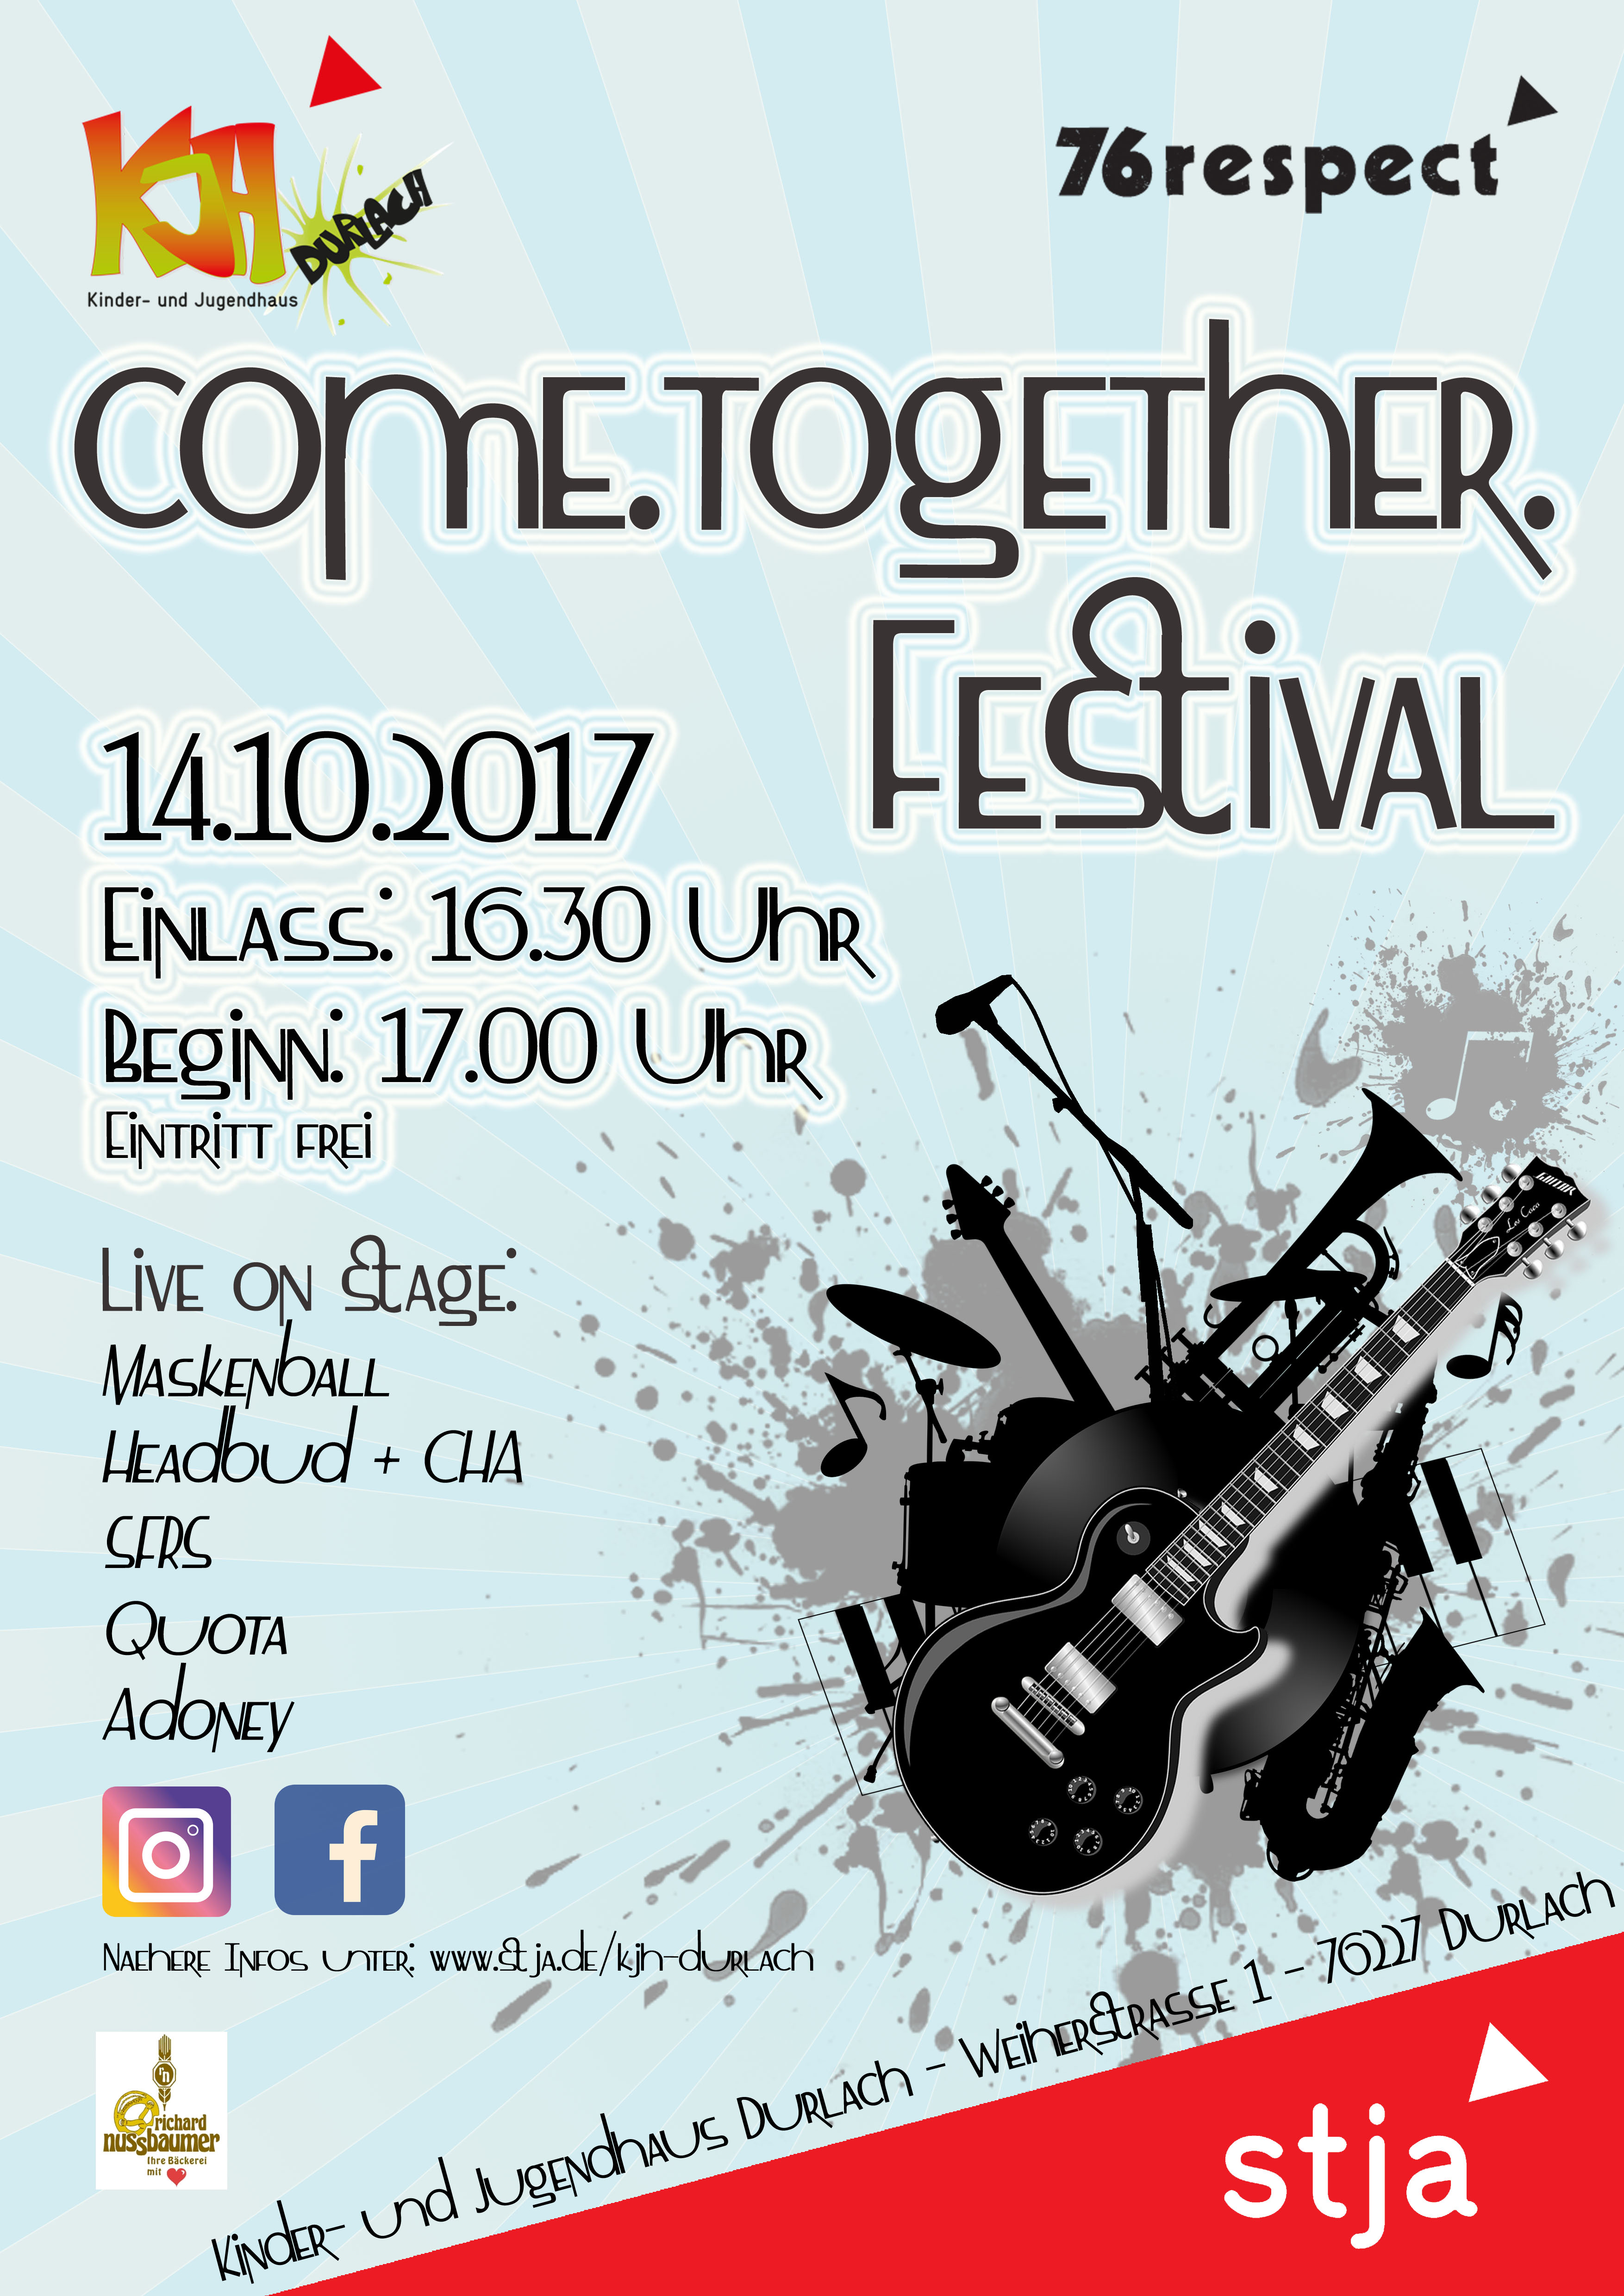 come.together.festival.2017 Plakat